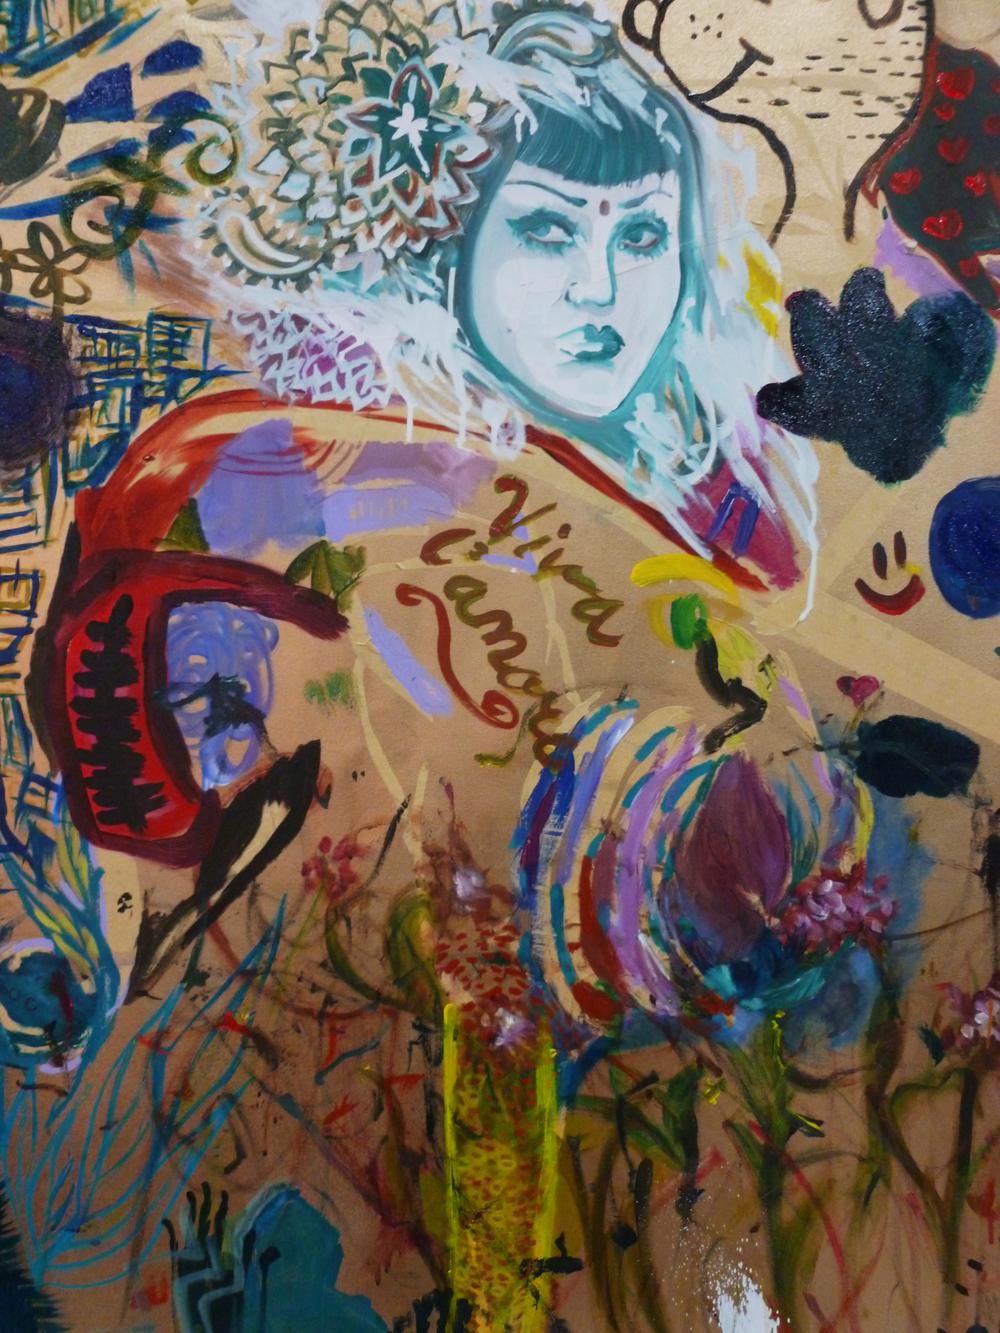 Detail of WOAS mural